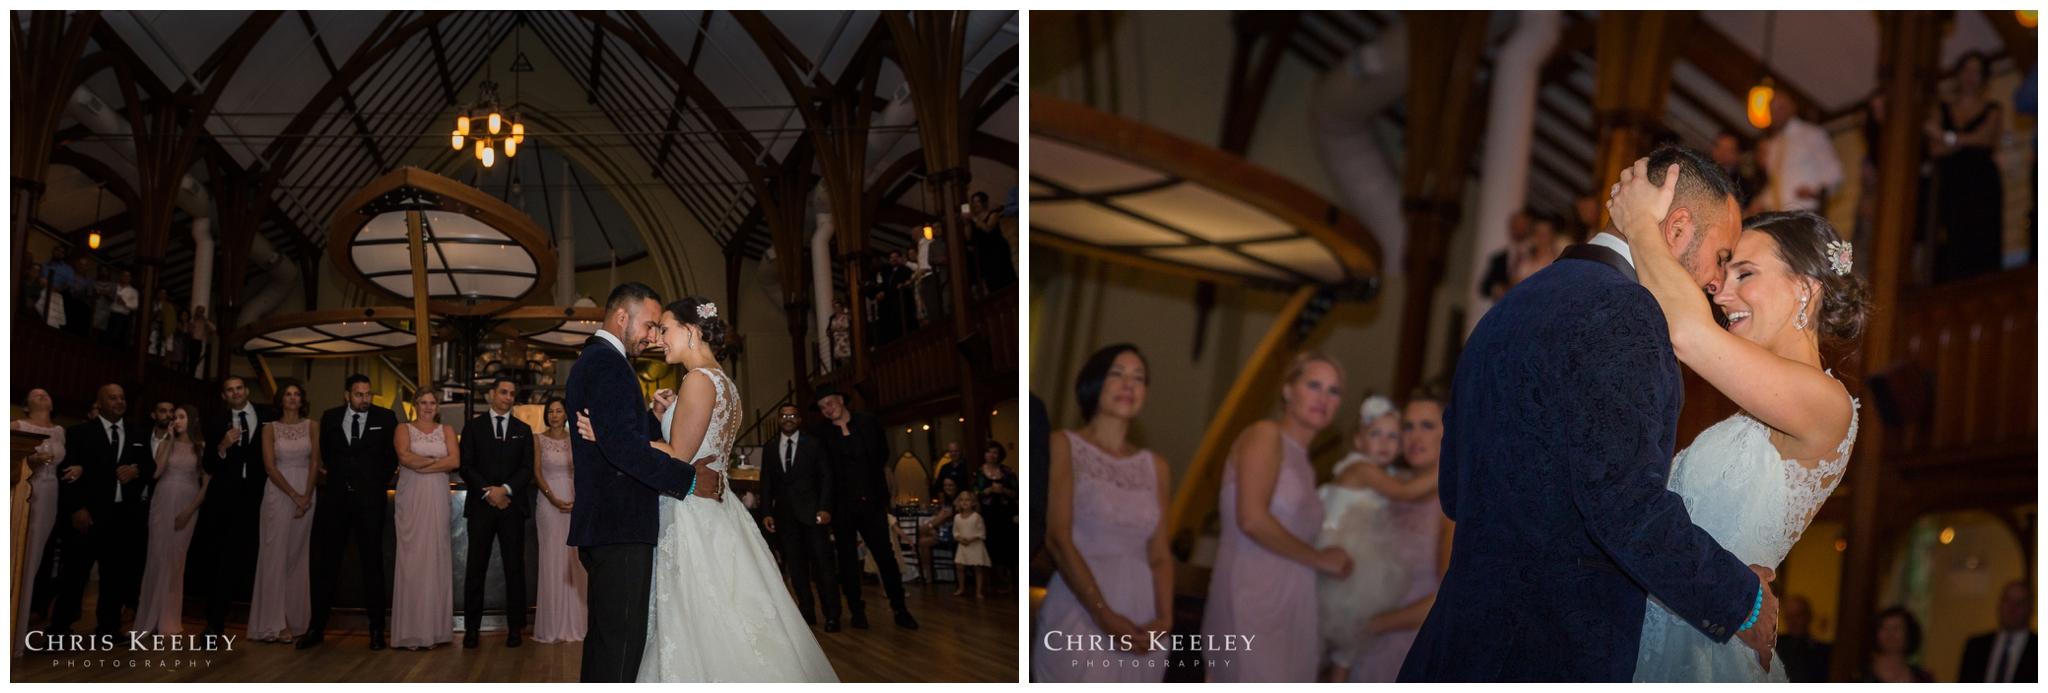 grace-restaurant-portland-maine-wedding-photographer-chris-keeley-55.jpg